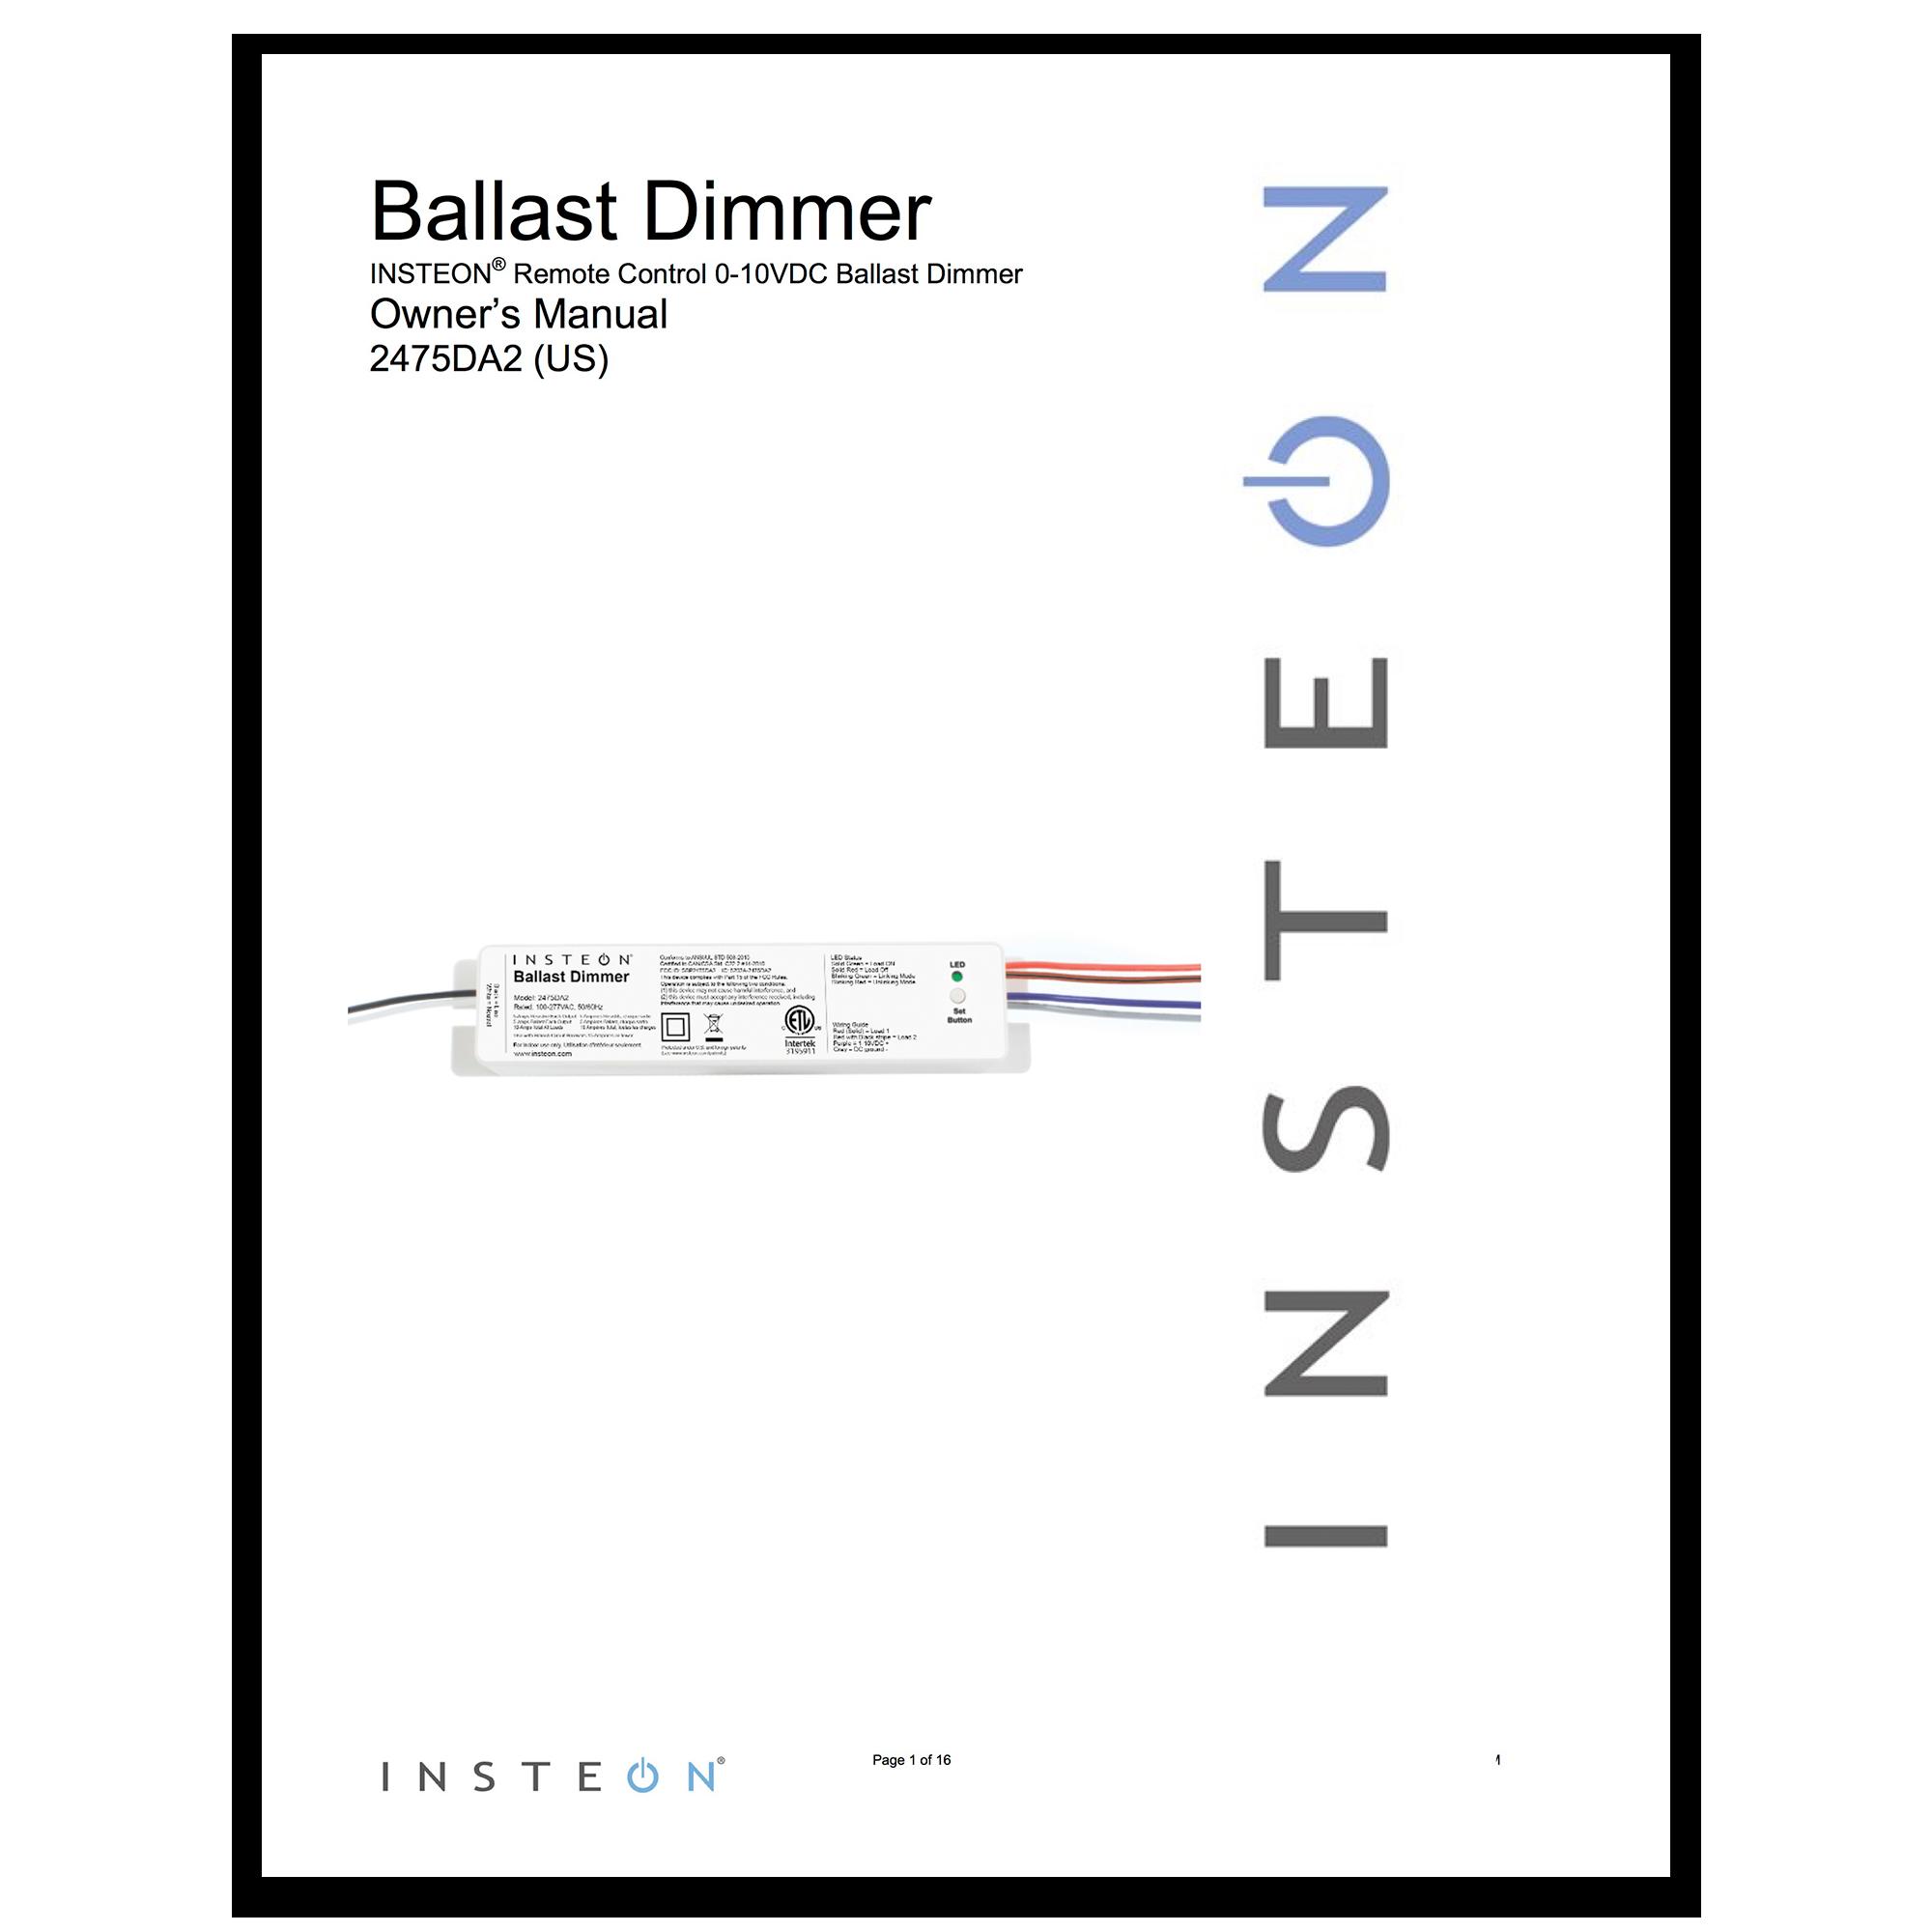 Manuals 2475da2?format=300w 0 10v ballast dimmer insteon step dimming ballast wiring diagram at readyjetset.co